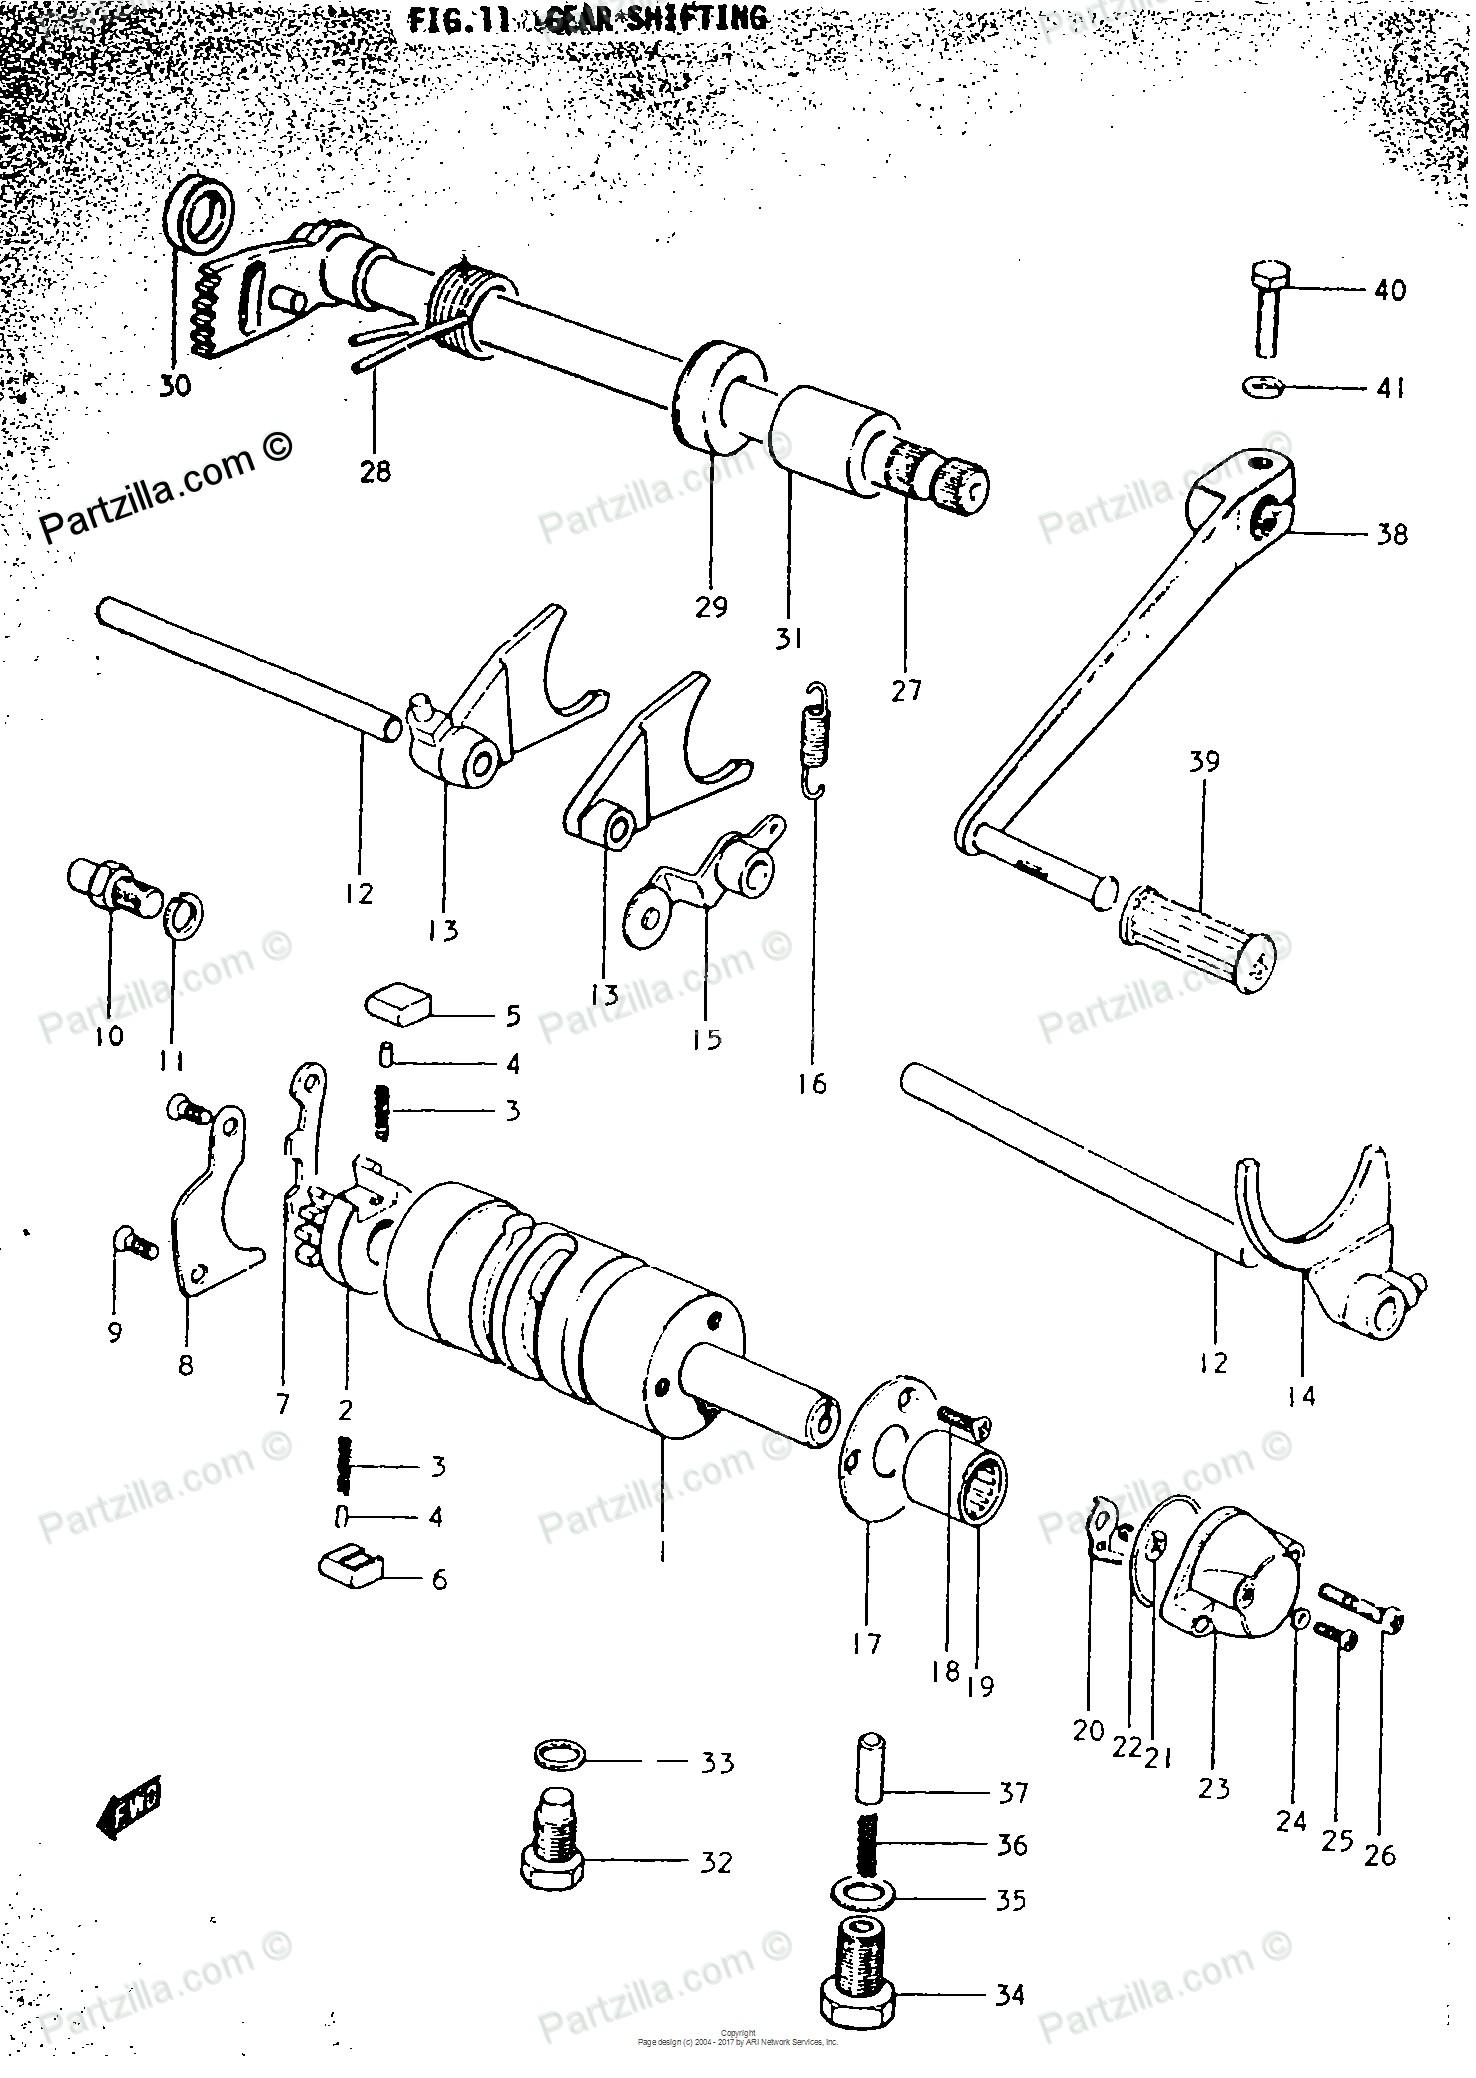 Motorcycle Engine Parts Diagram 50cc Mini Chopper Custom Wiring Suzuki 1969 Oem For Gear Shifting Of